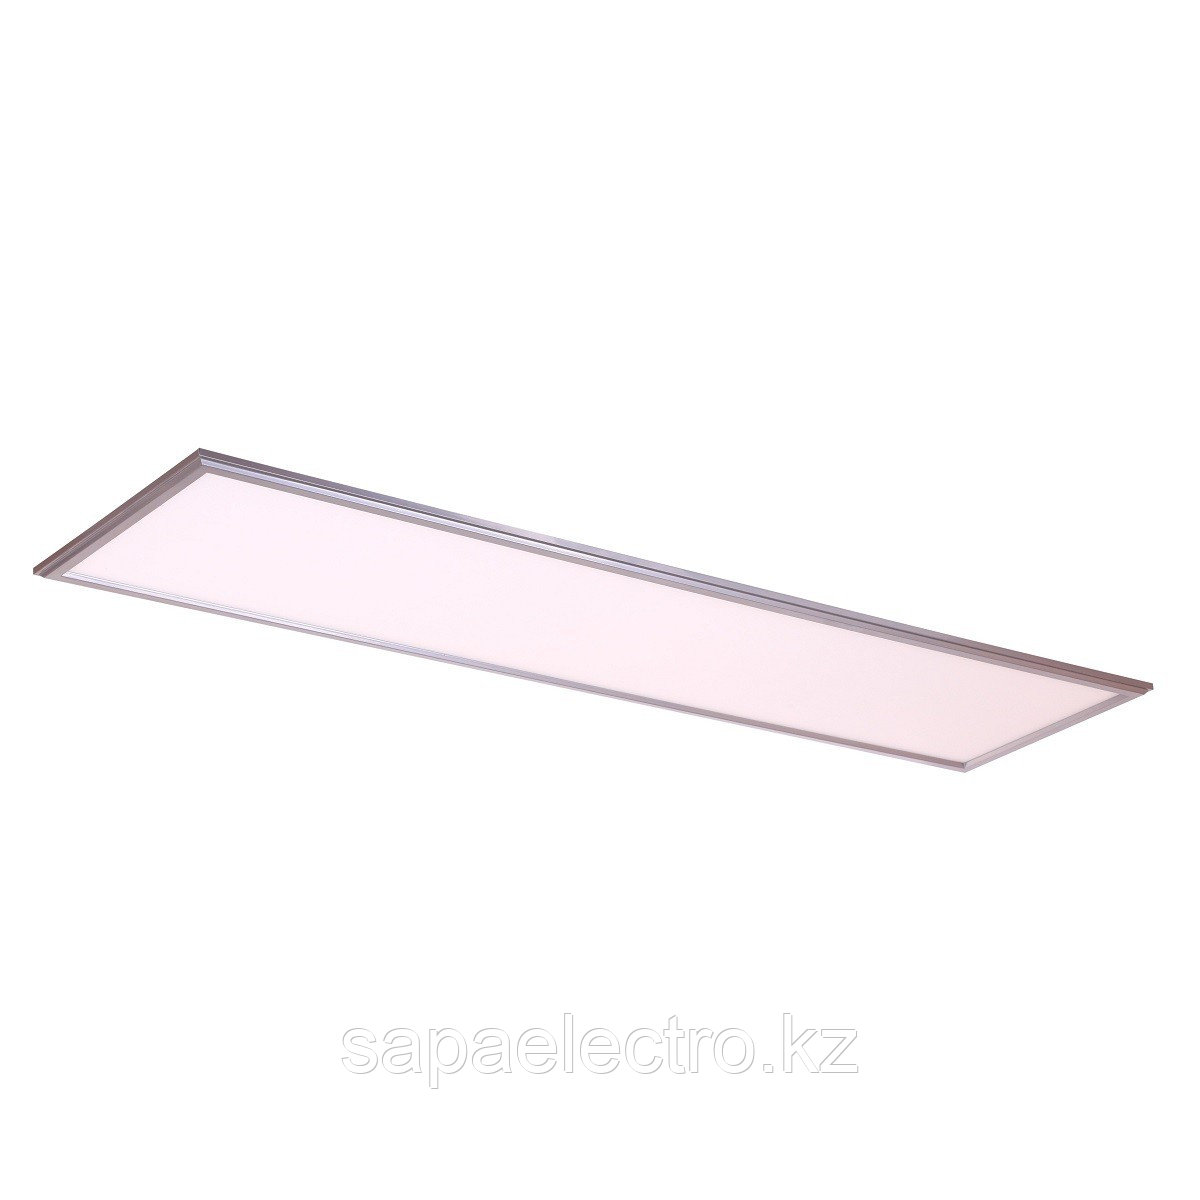 Свет-к LED PANEL 50W 295x1195мм 6400K (TS) 6sht